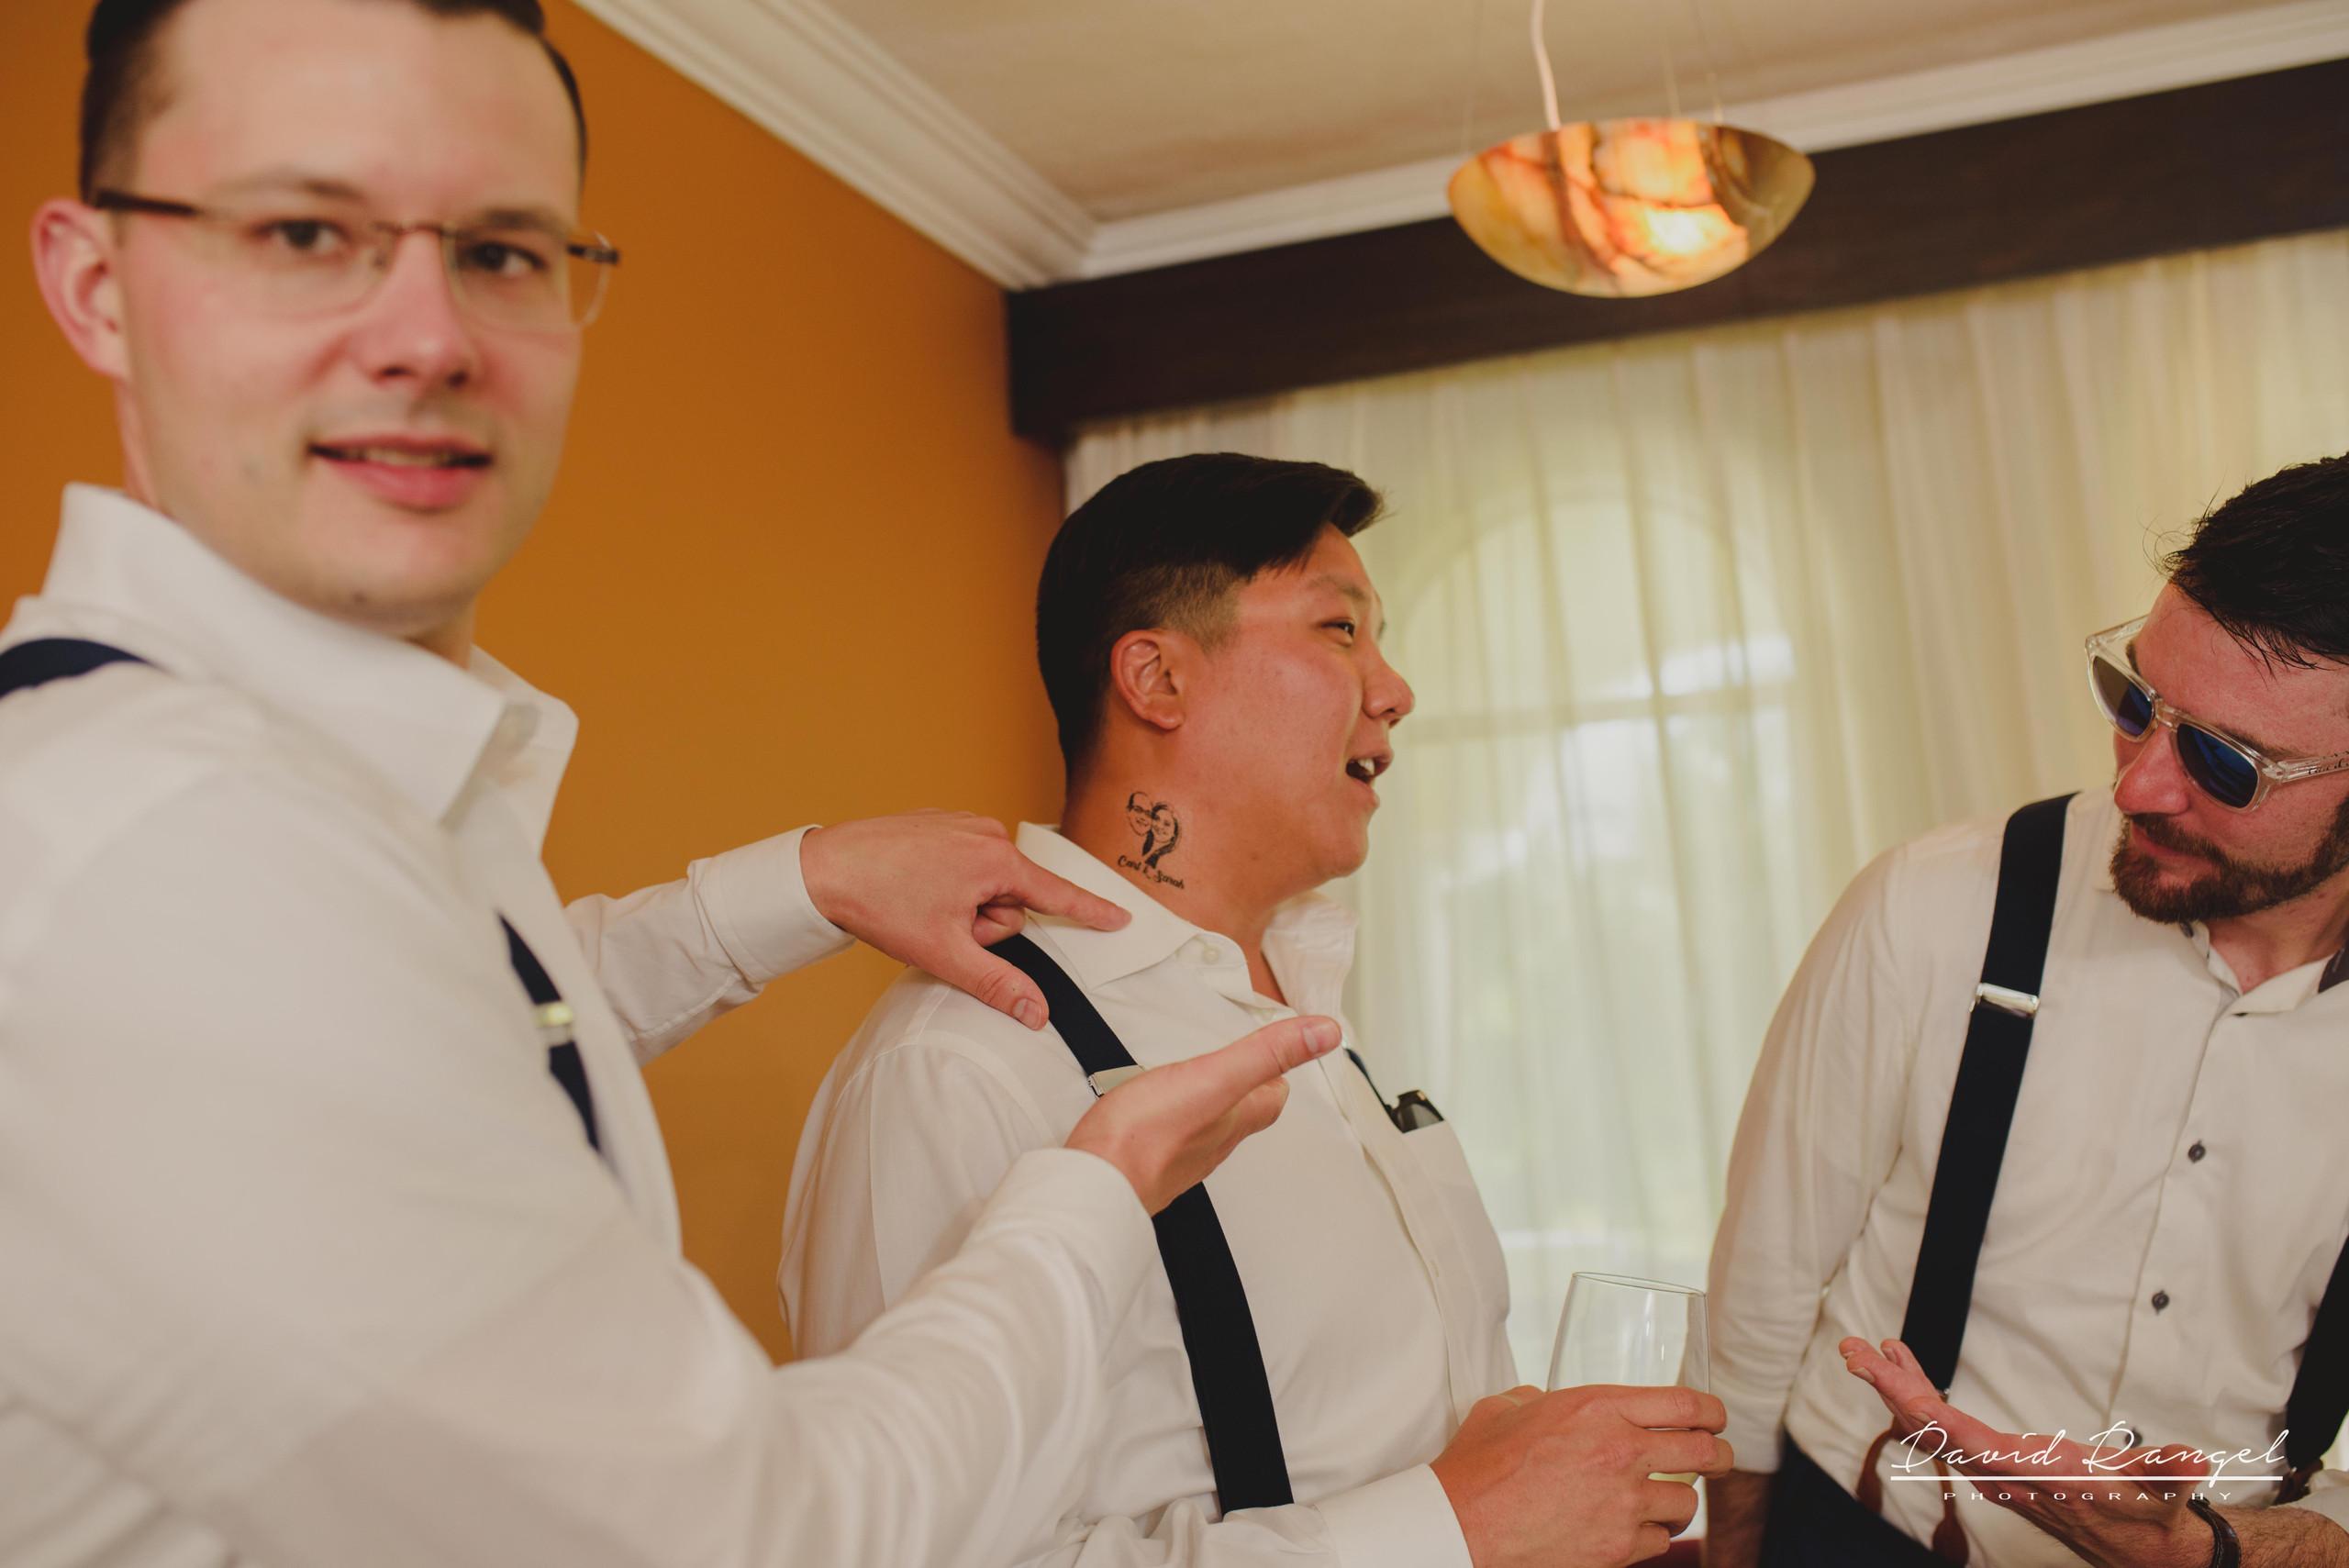 groom+groomsmens+getting+ready+room+photo+suit+crew+tatto